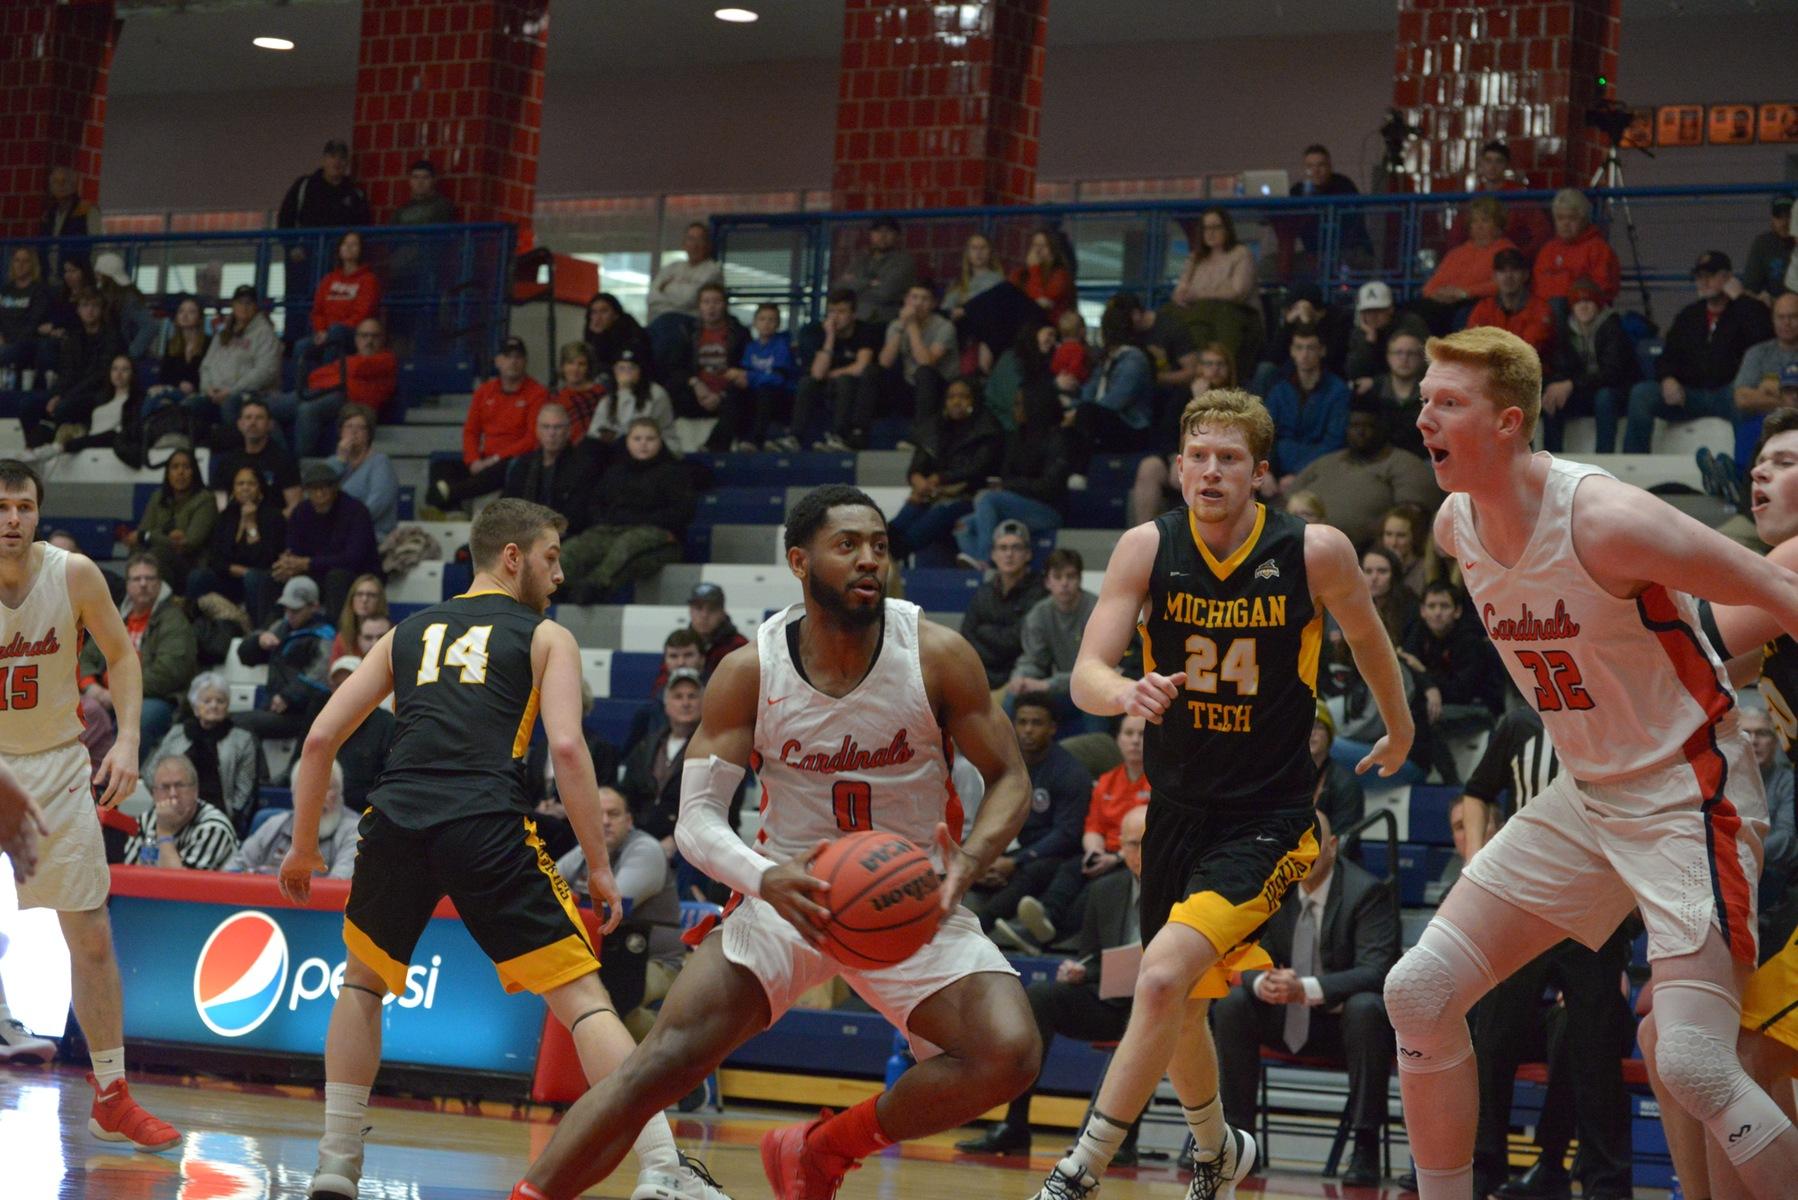 Men's Basketball vs Michigan Tech - Feb. 1. 2020 - Saginaw Valley State